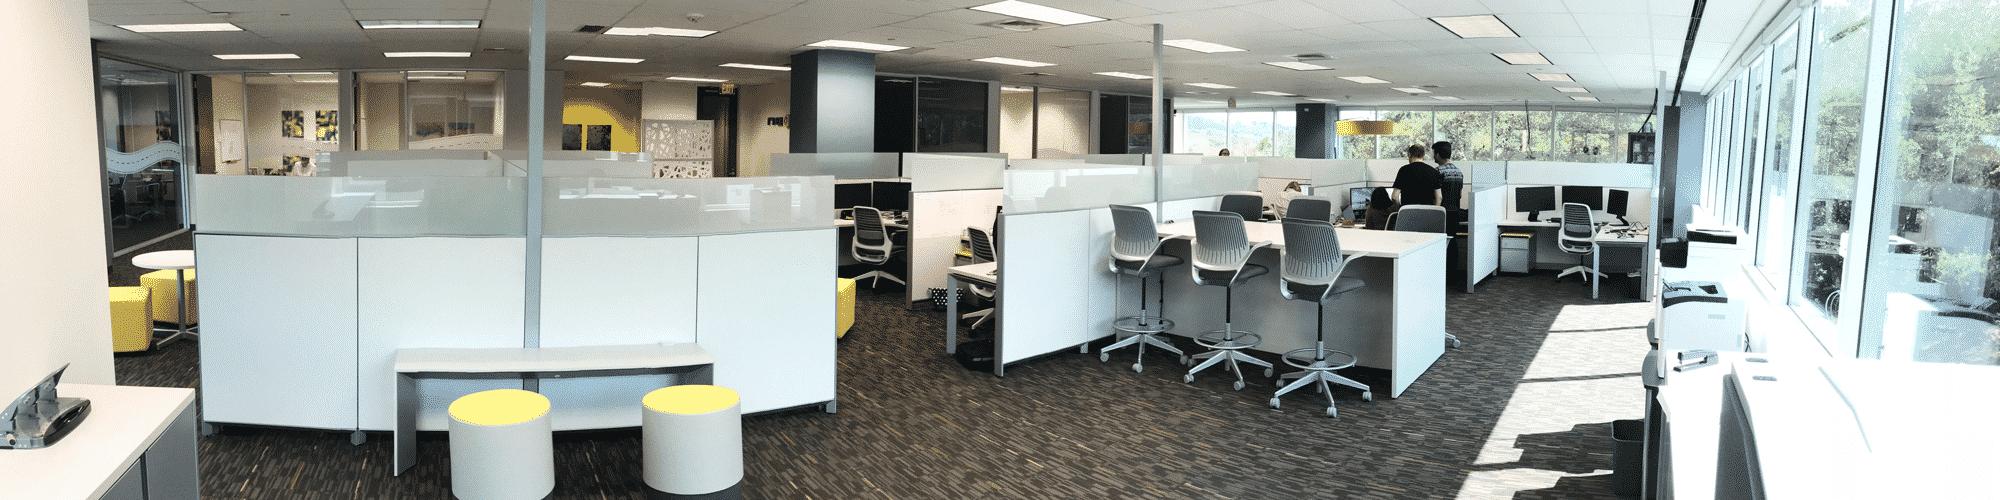 Lakewood Center 2 Sublease - Suite 220 - Interior